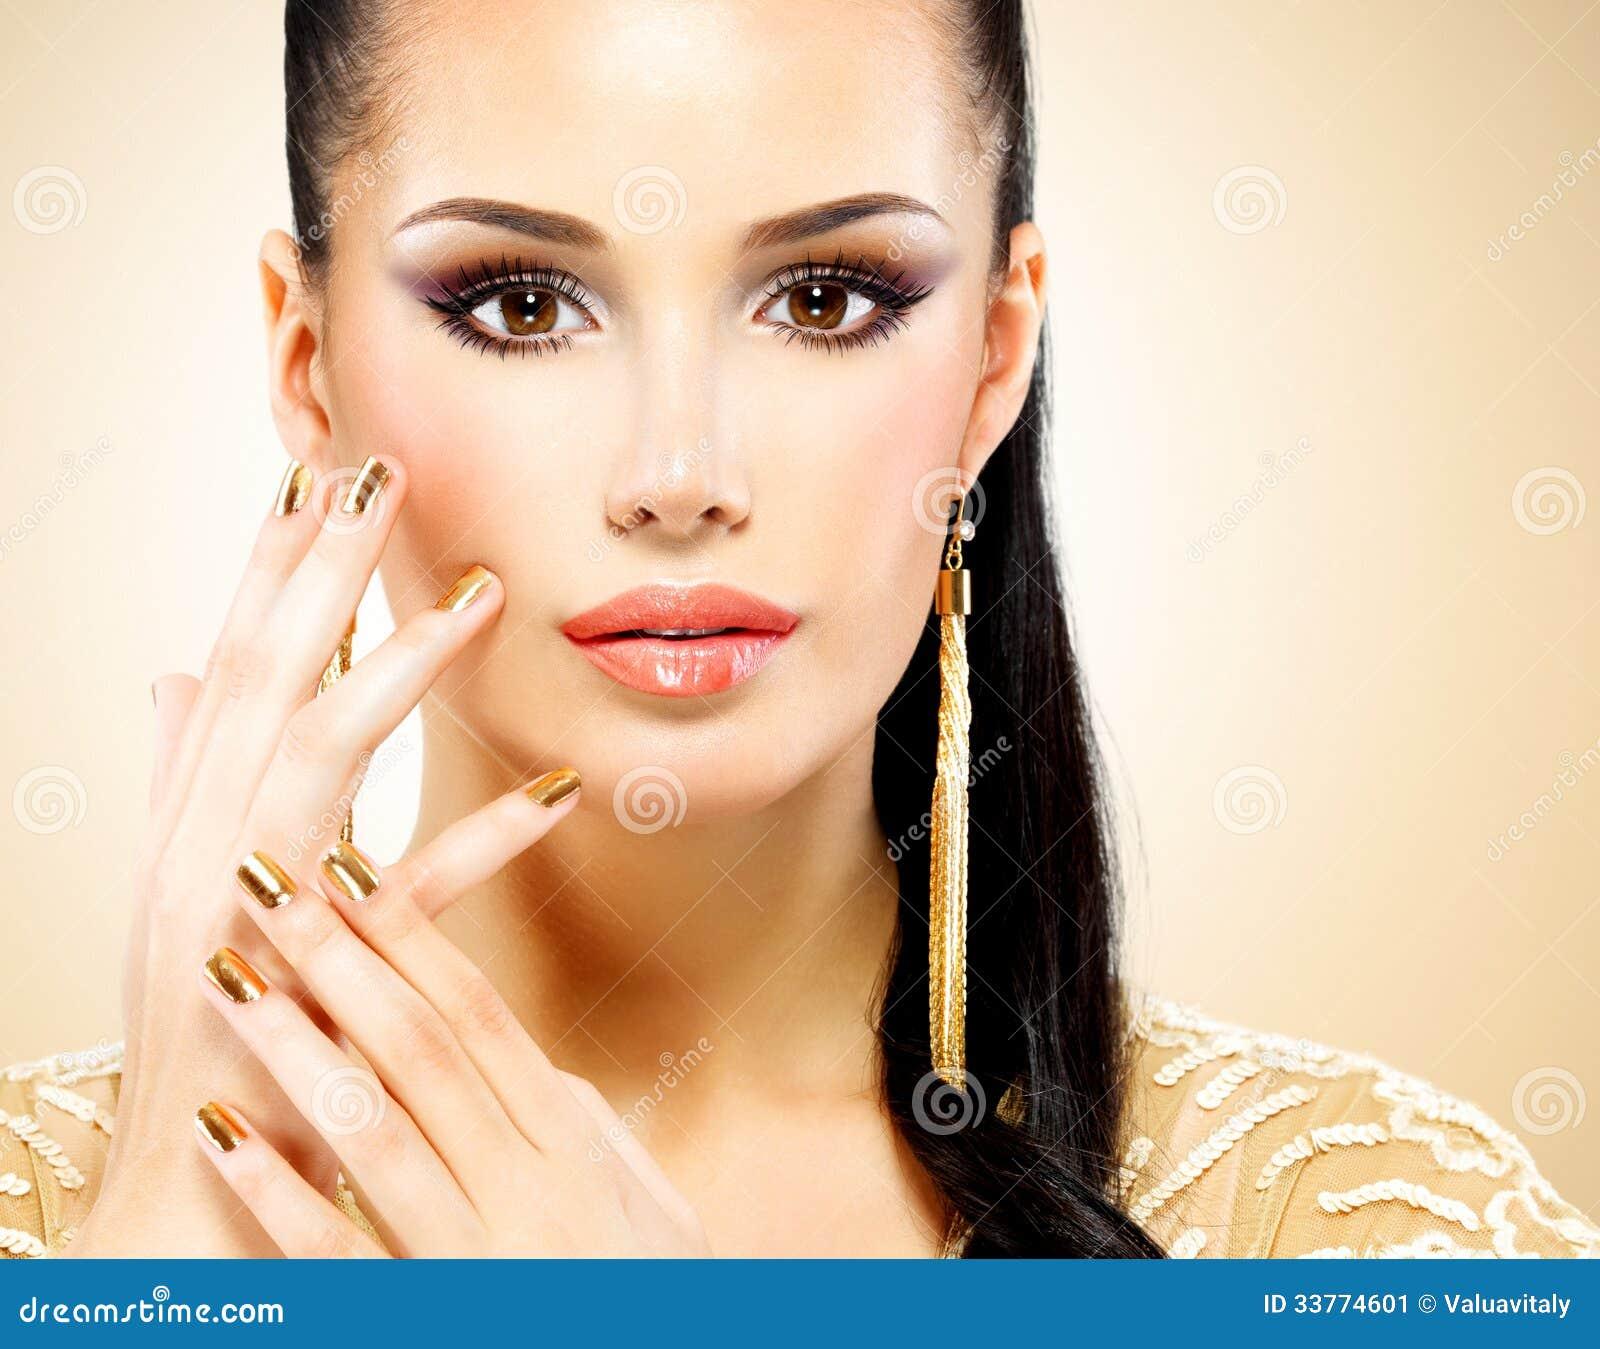 Centella – Cosmétique Bio Visage, Corps et Maquillage  Centella